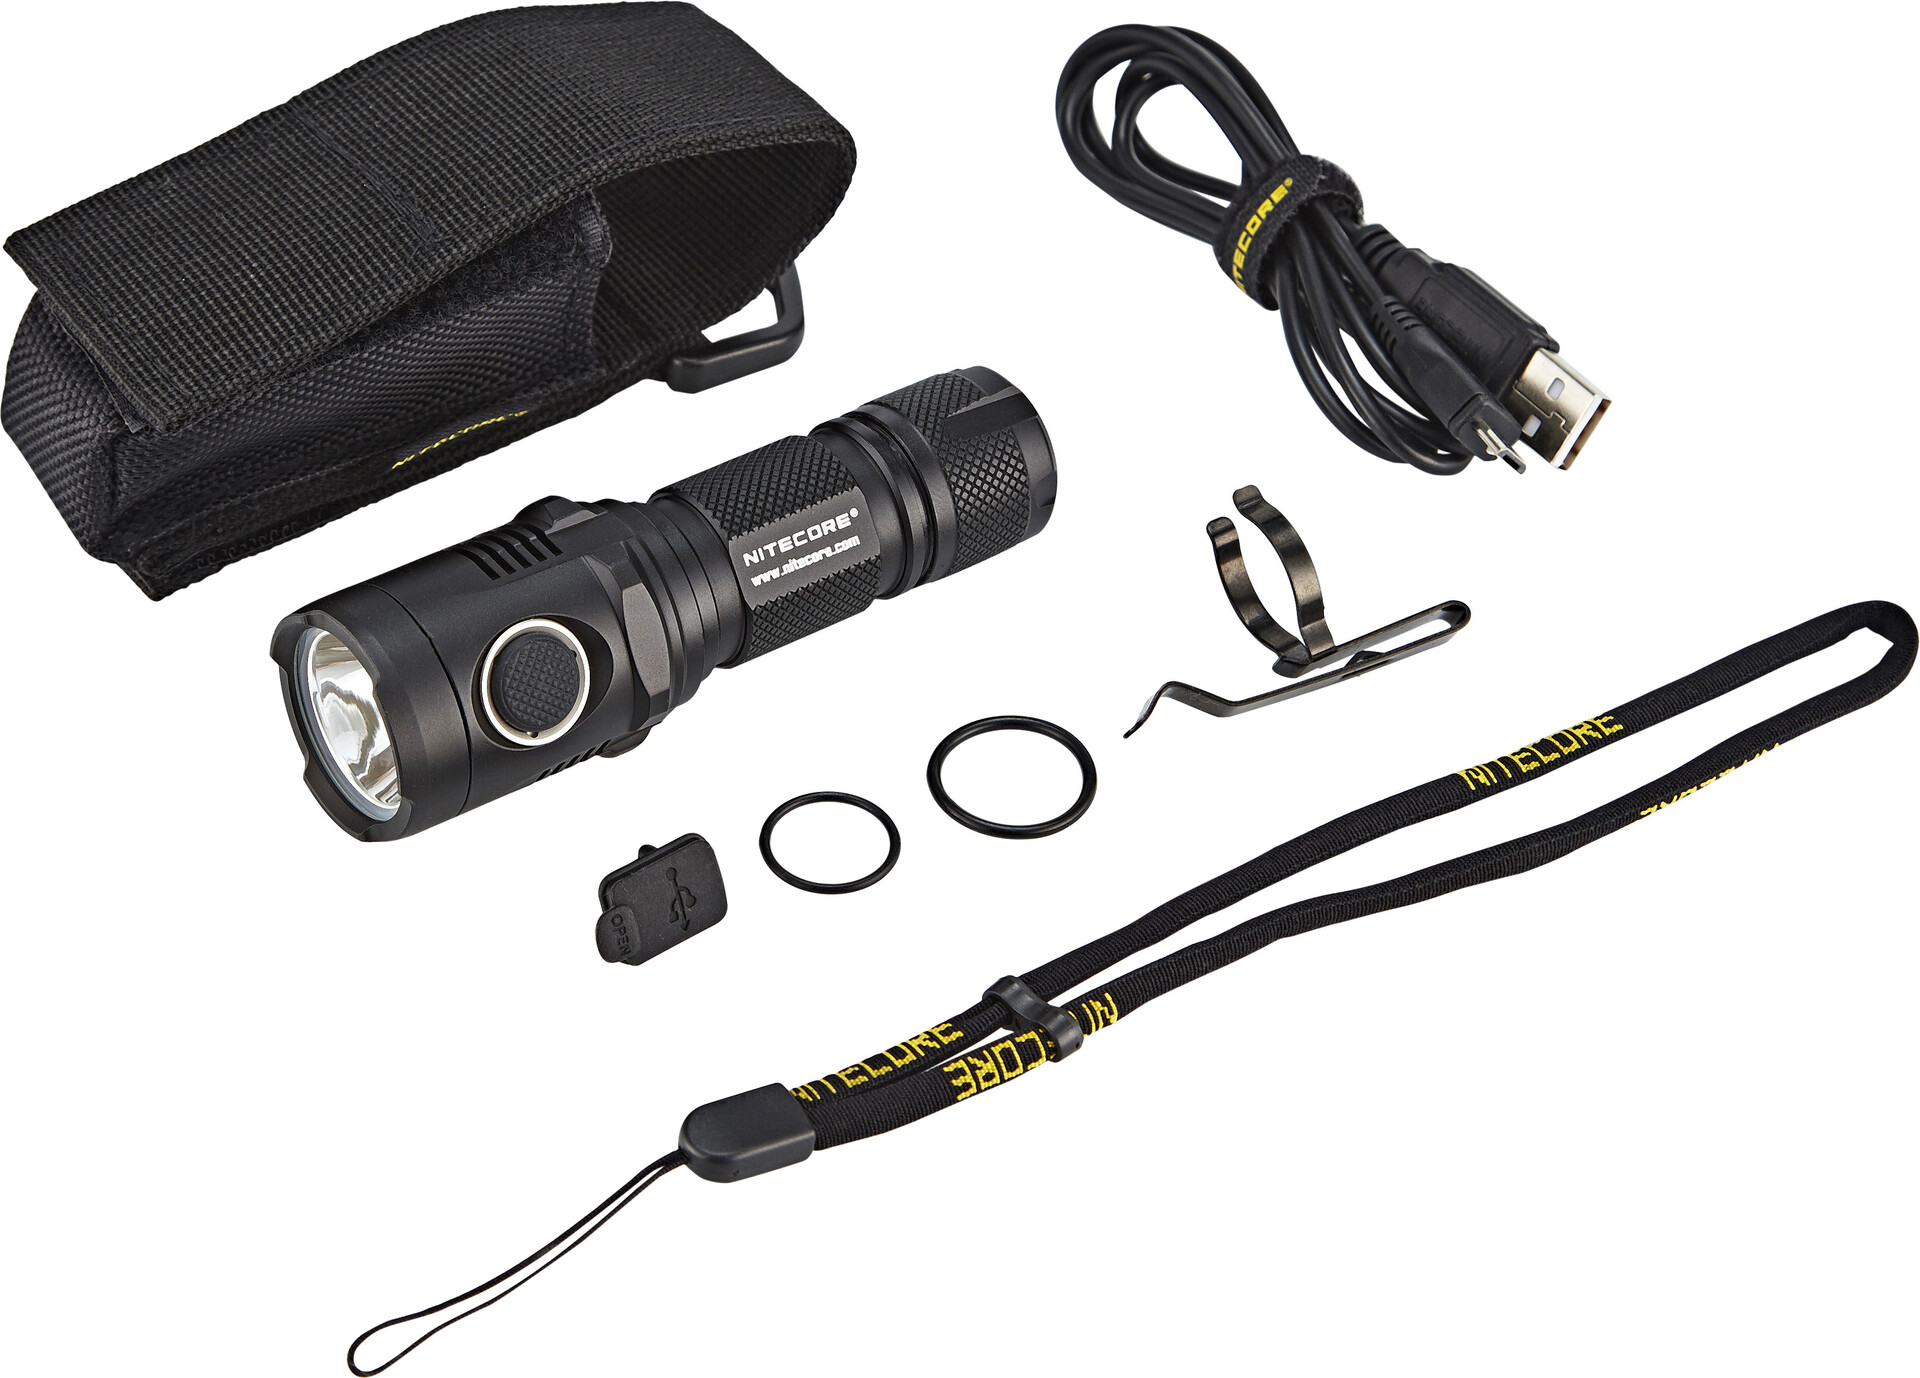 nitecore mh ,Cheap nitecore mh For LED Flashlight & Bicycle